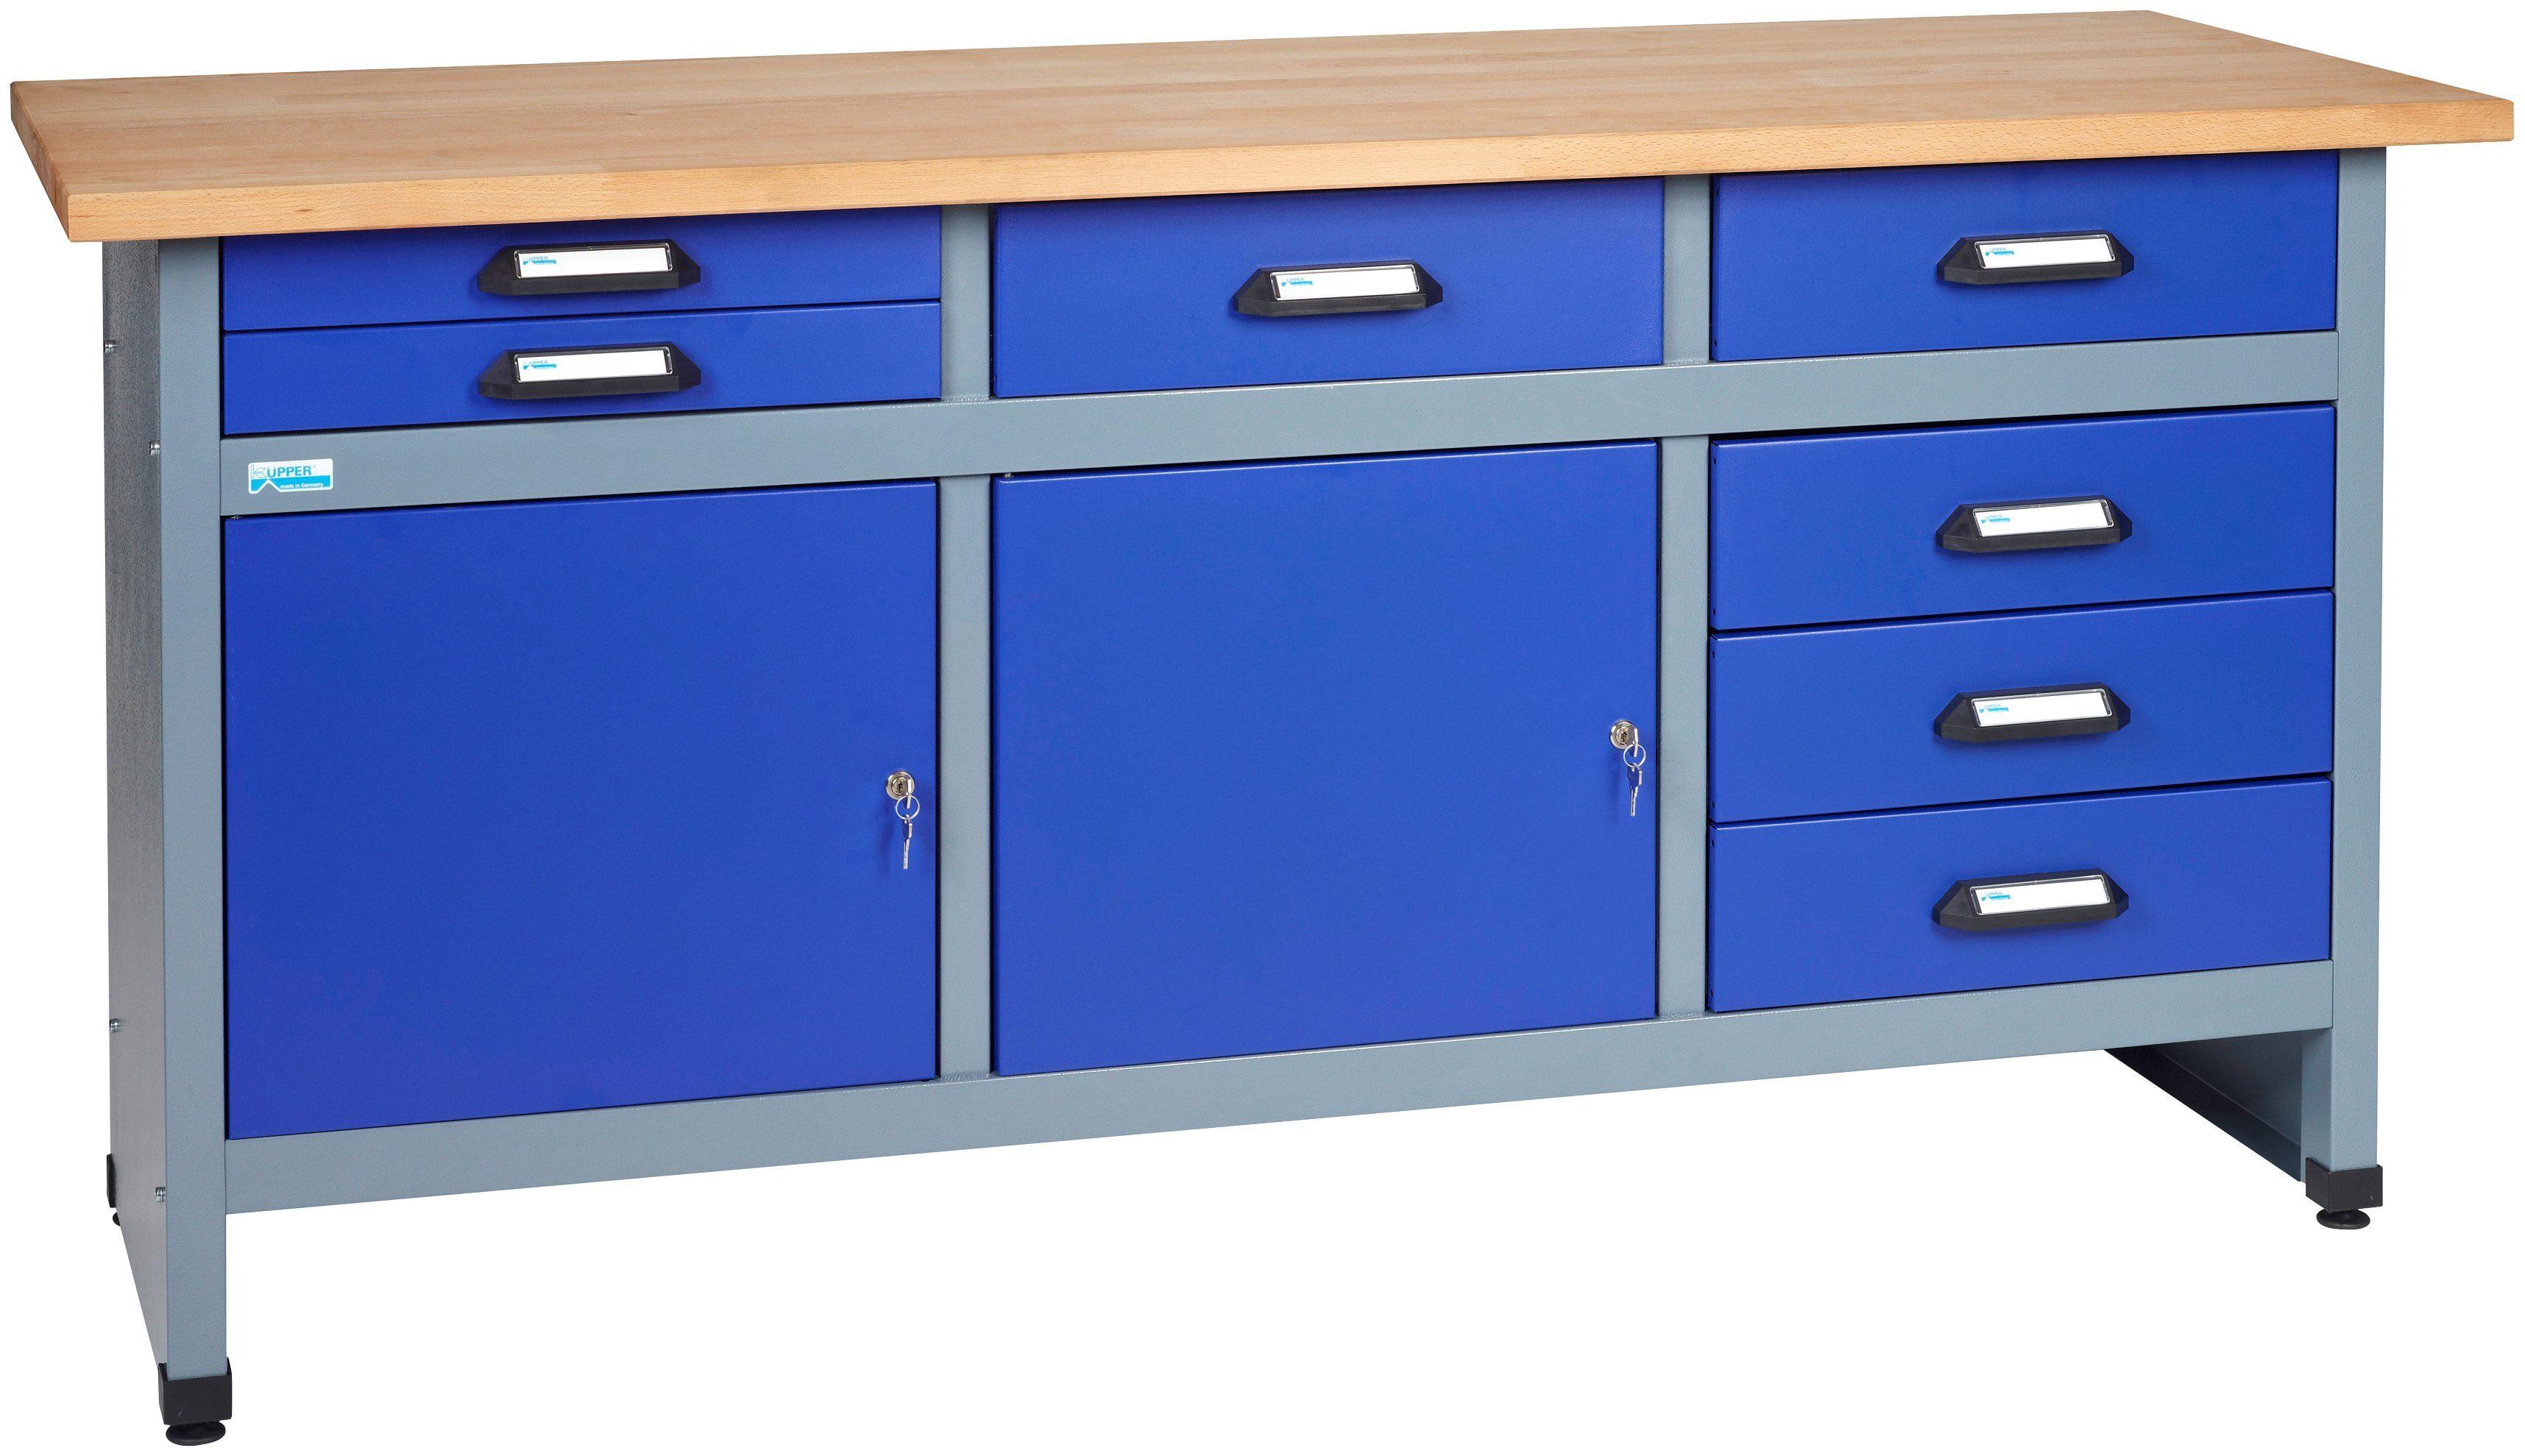 KÜPPER Werkbank »2 Türen, 7 Schubladen, in ultramarinblau«